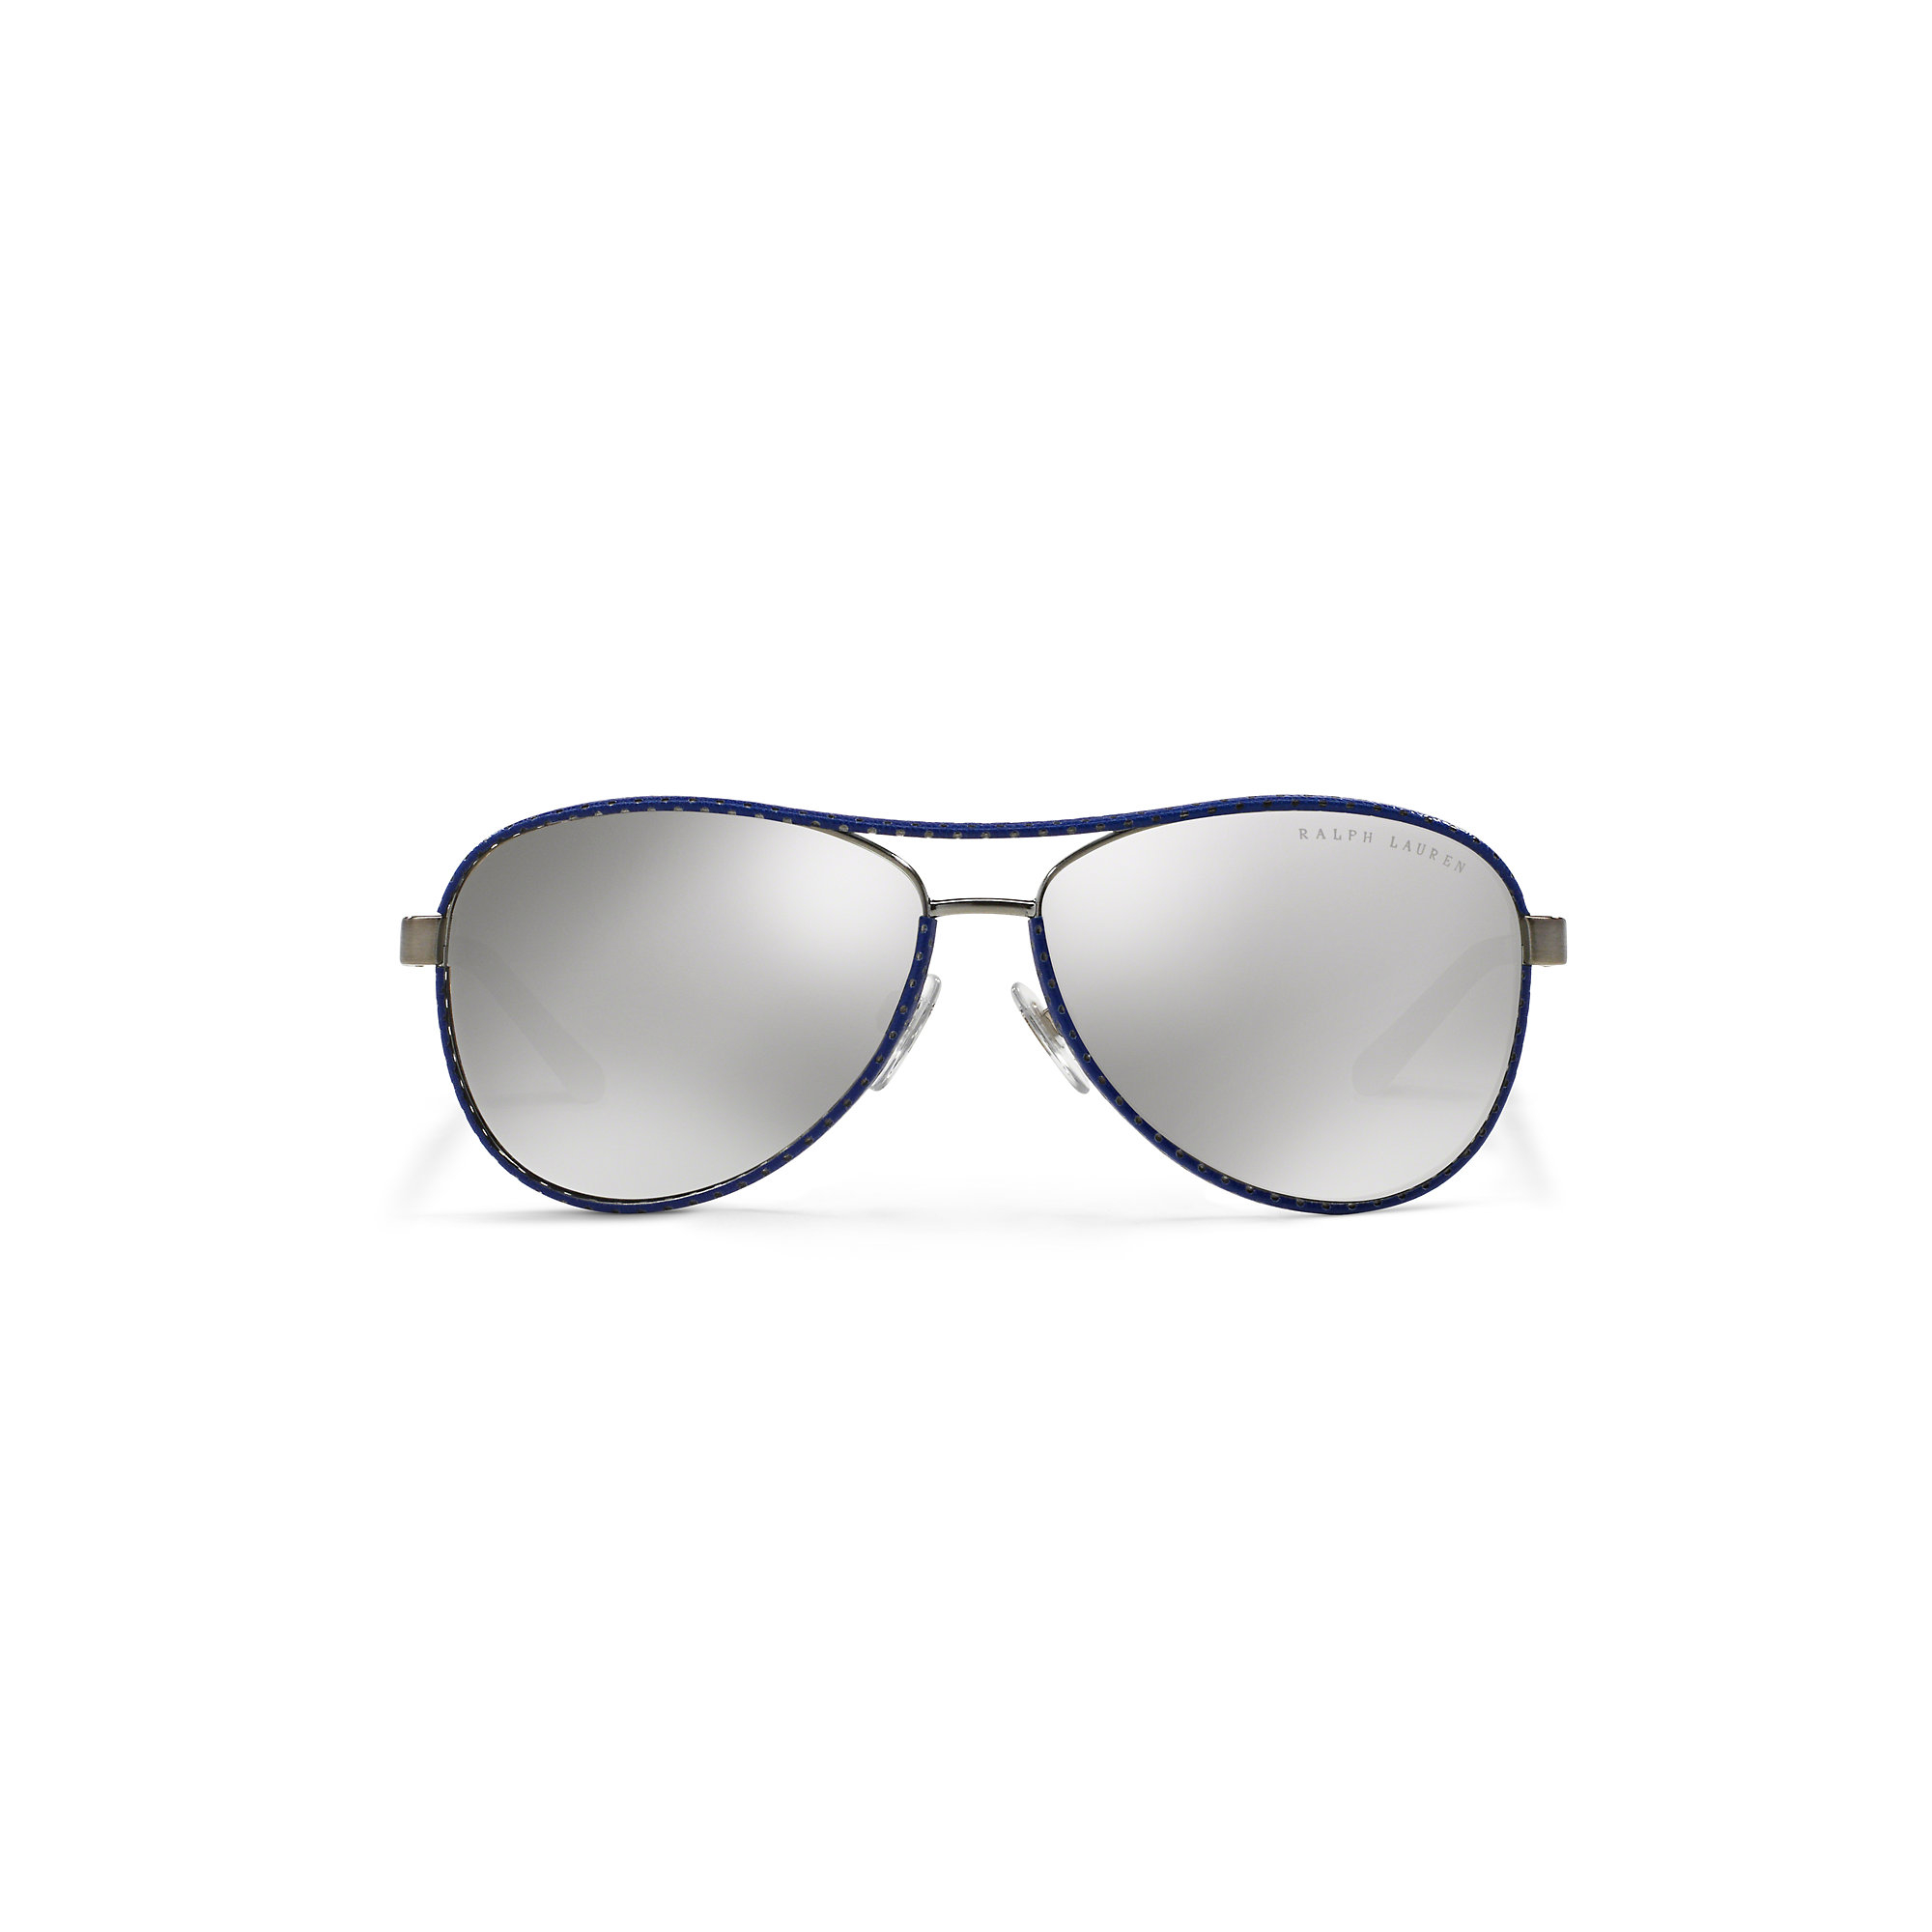 5ce0bfea1ef7 Chloe Tamaris Aviator Sunglasses Reviews